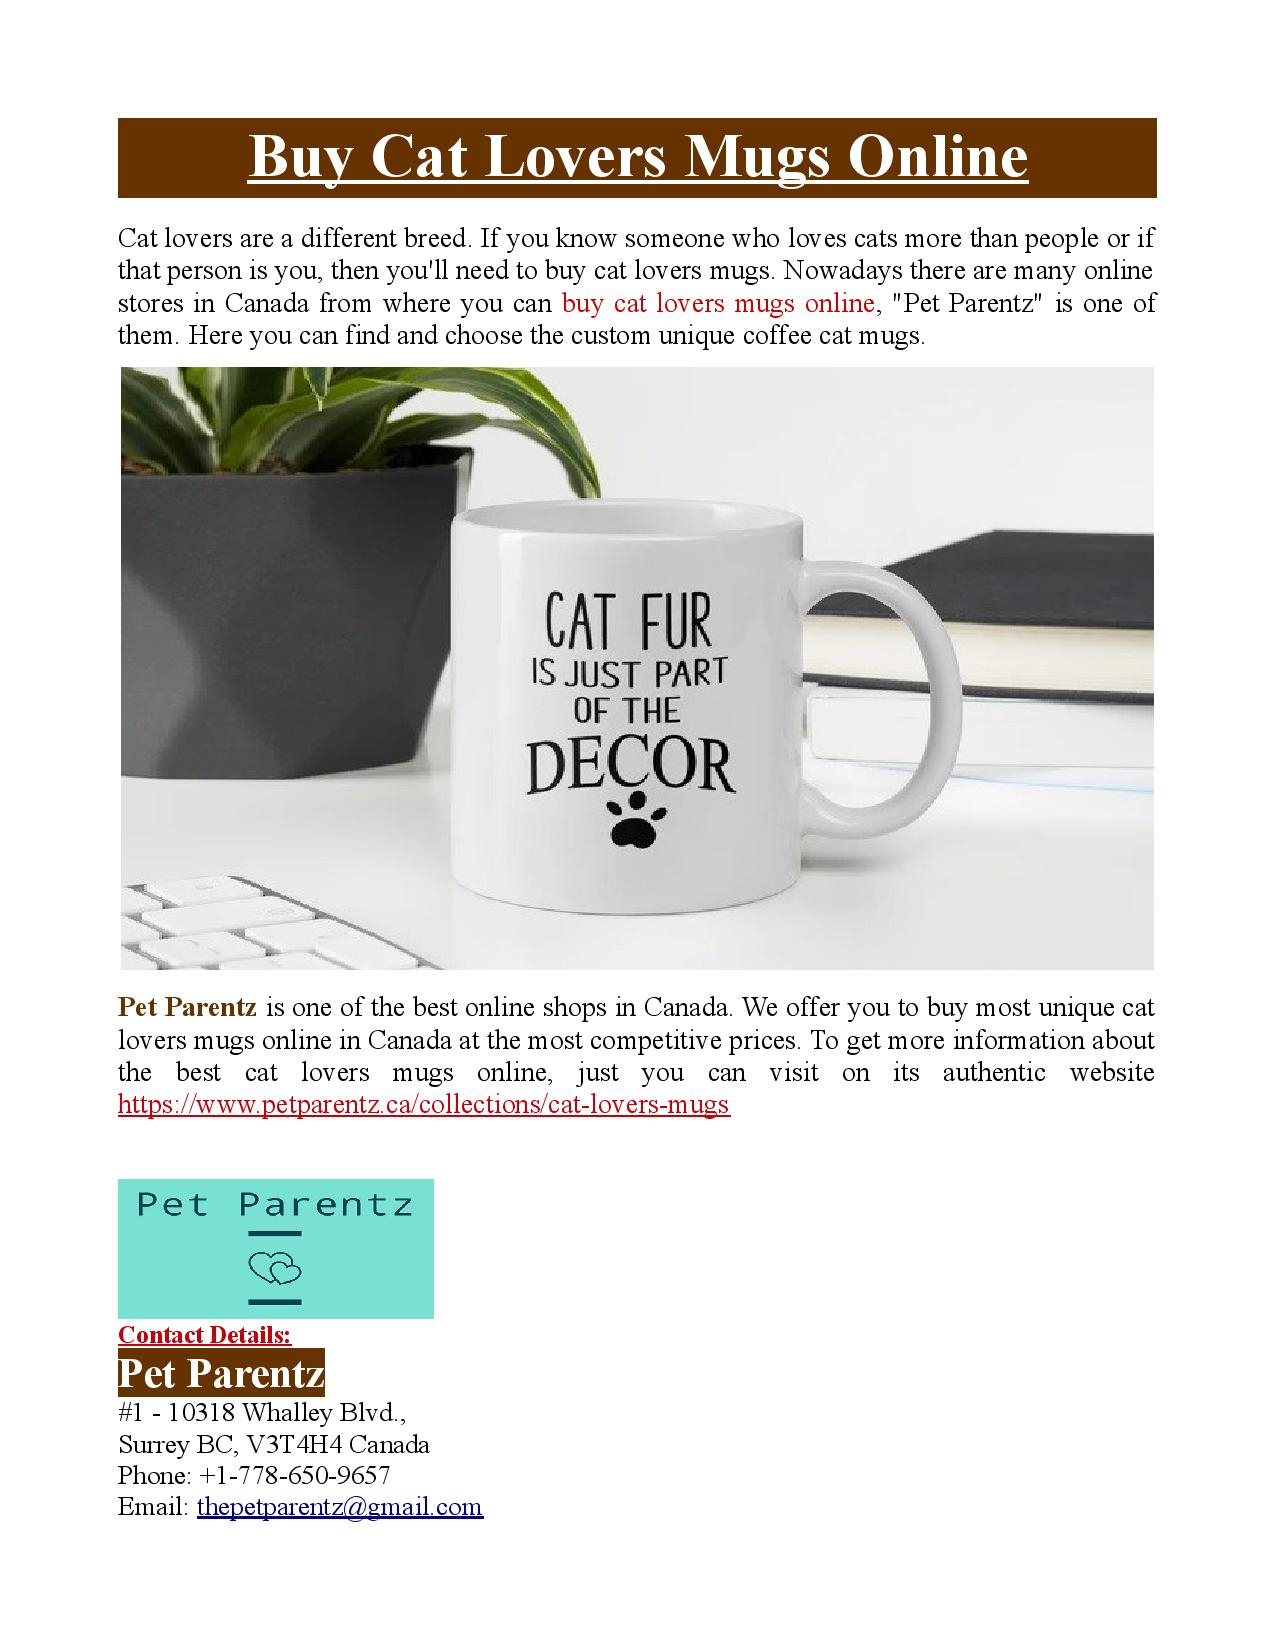 Buy Cat Lovers Mugs Online By Petparentz Cgsociety